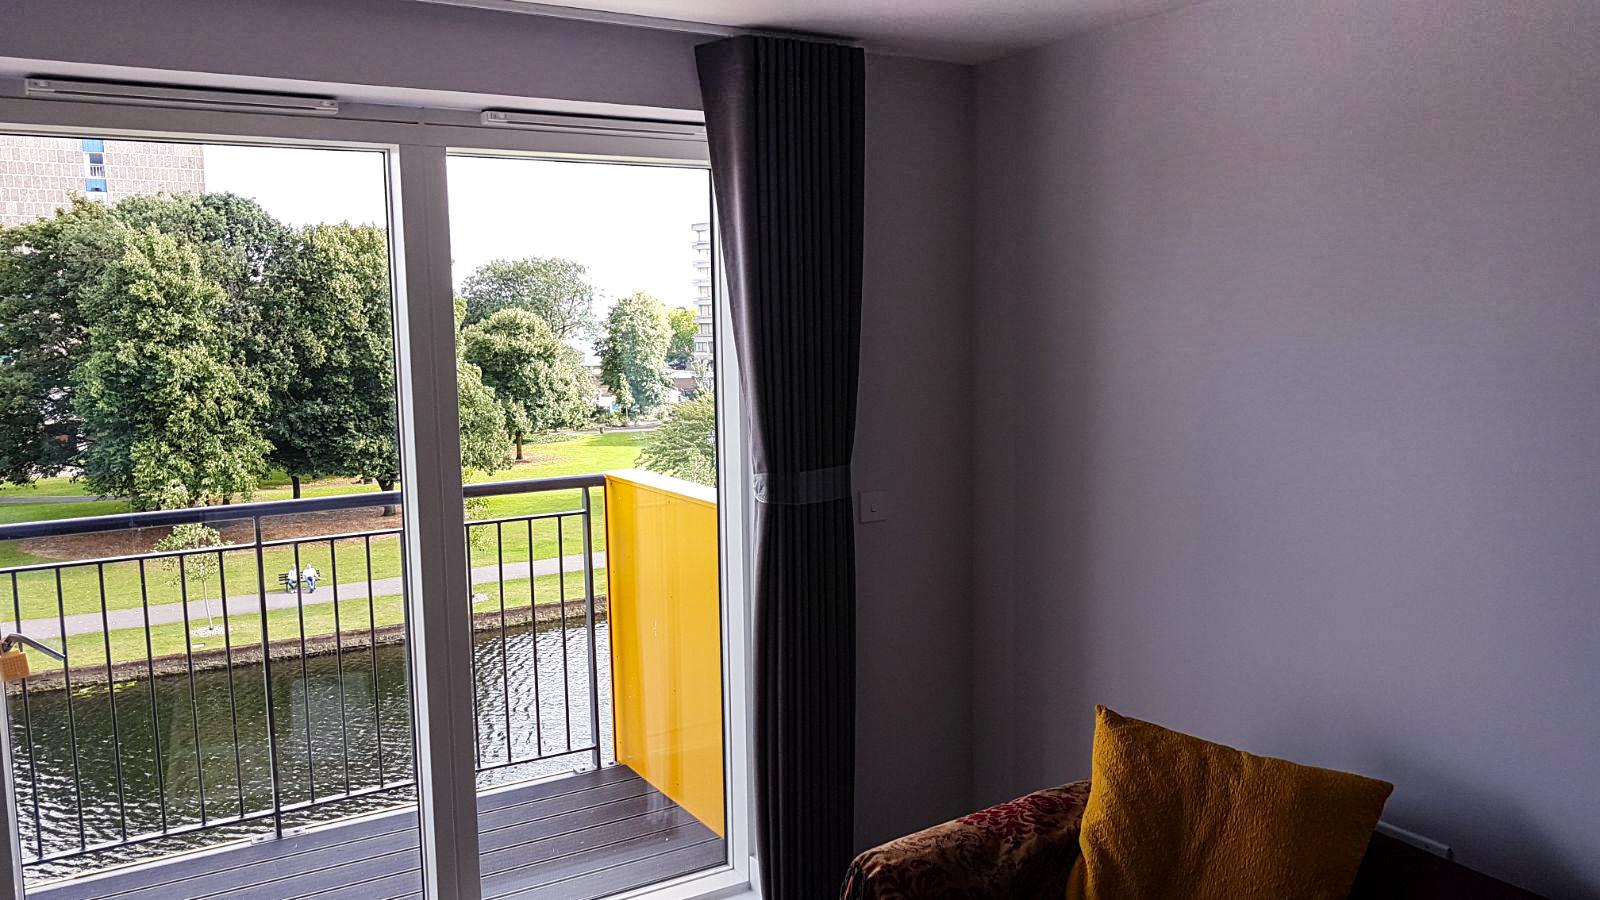 Curtains Blinds Furniture Landlords Rentals London